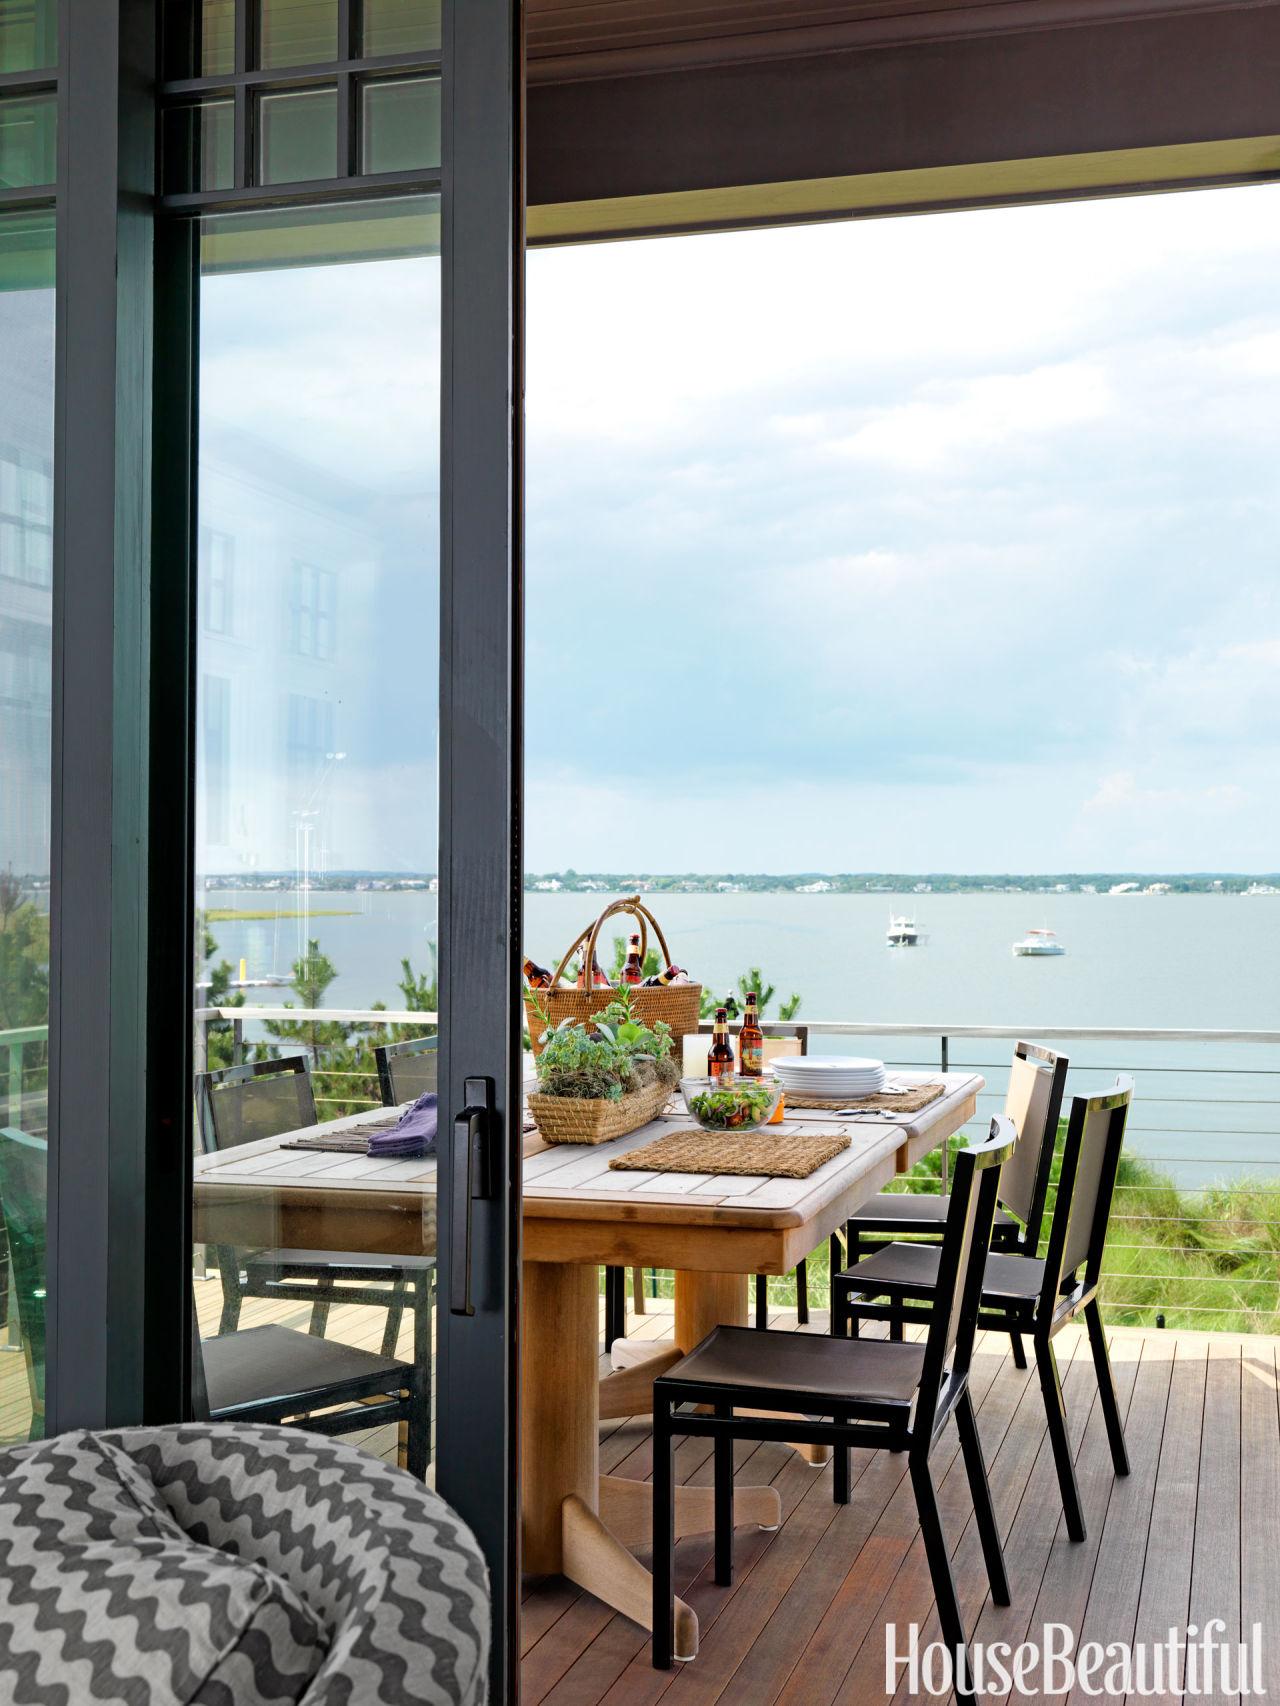 Home Design - Magazine cover